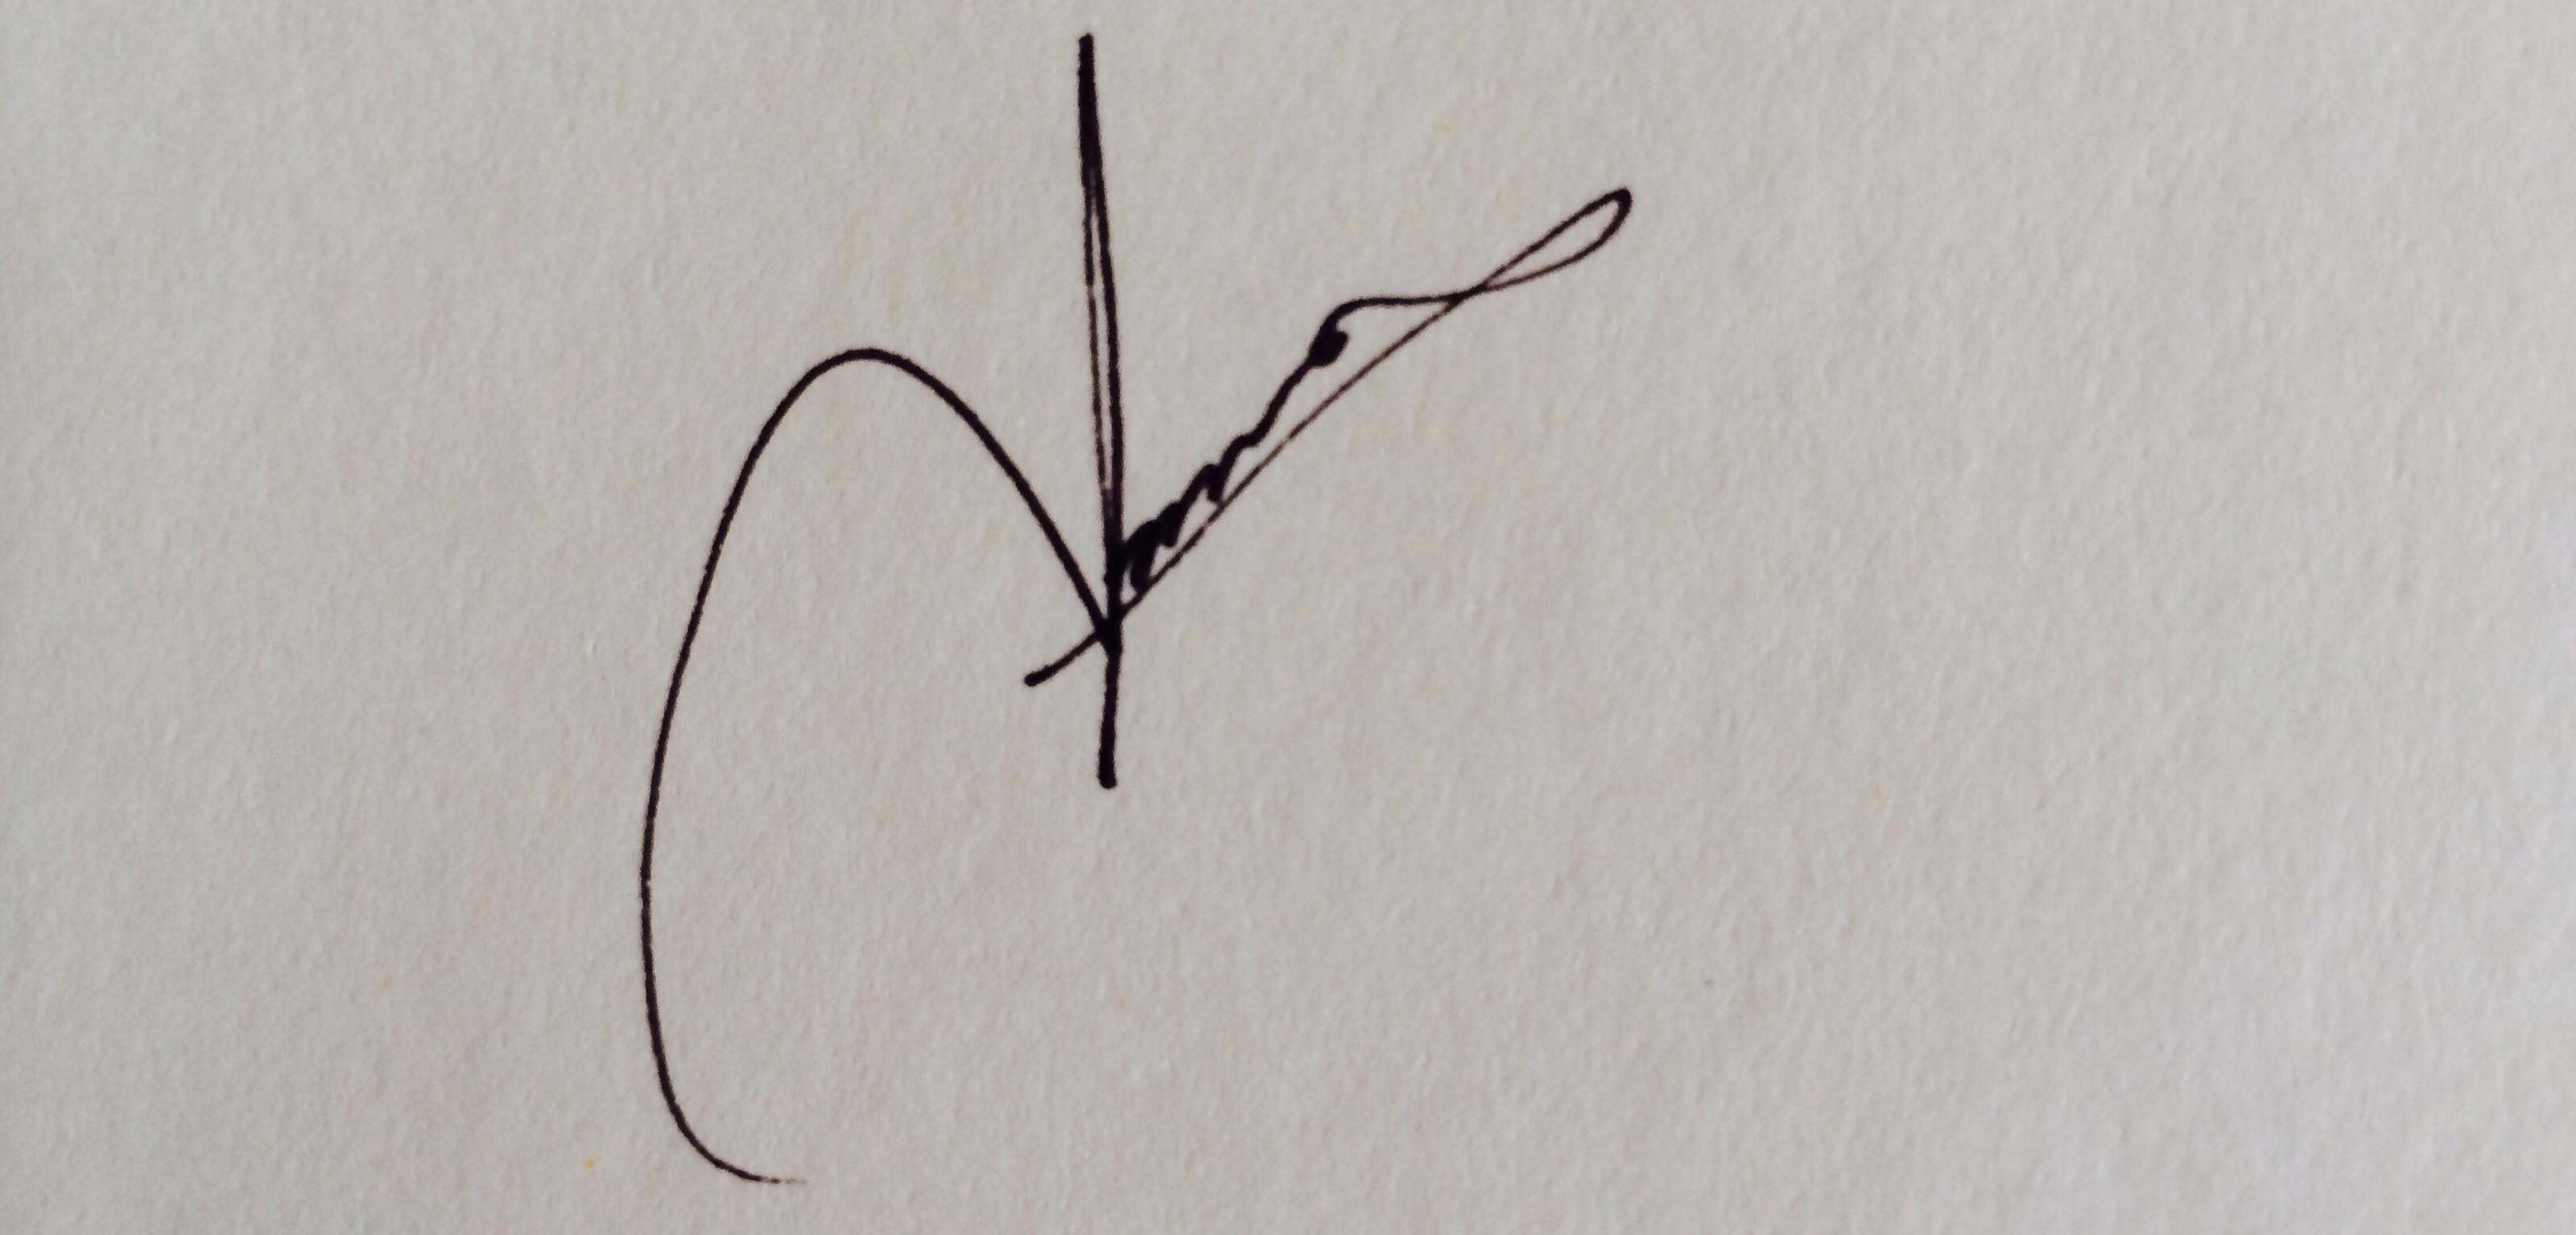 Amna Chaudhry's Signature